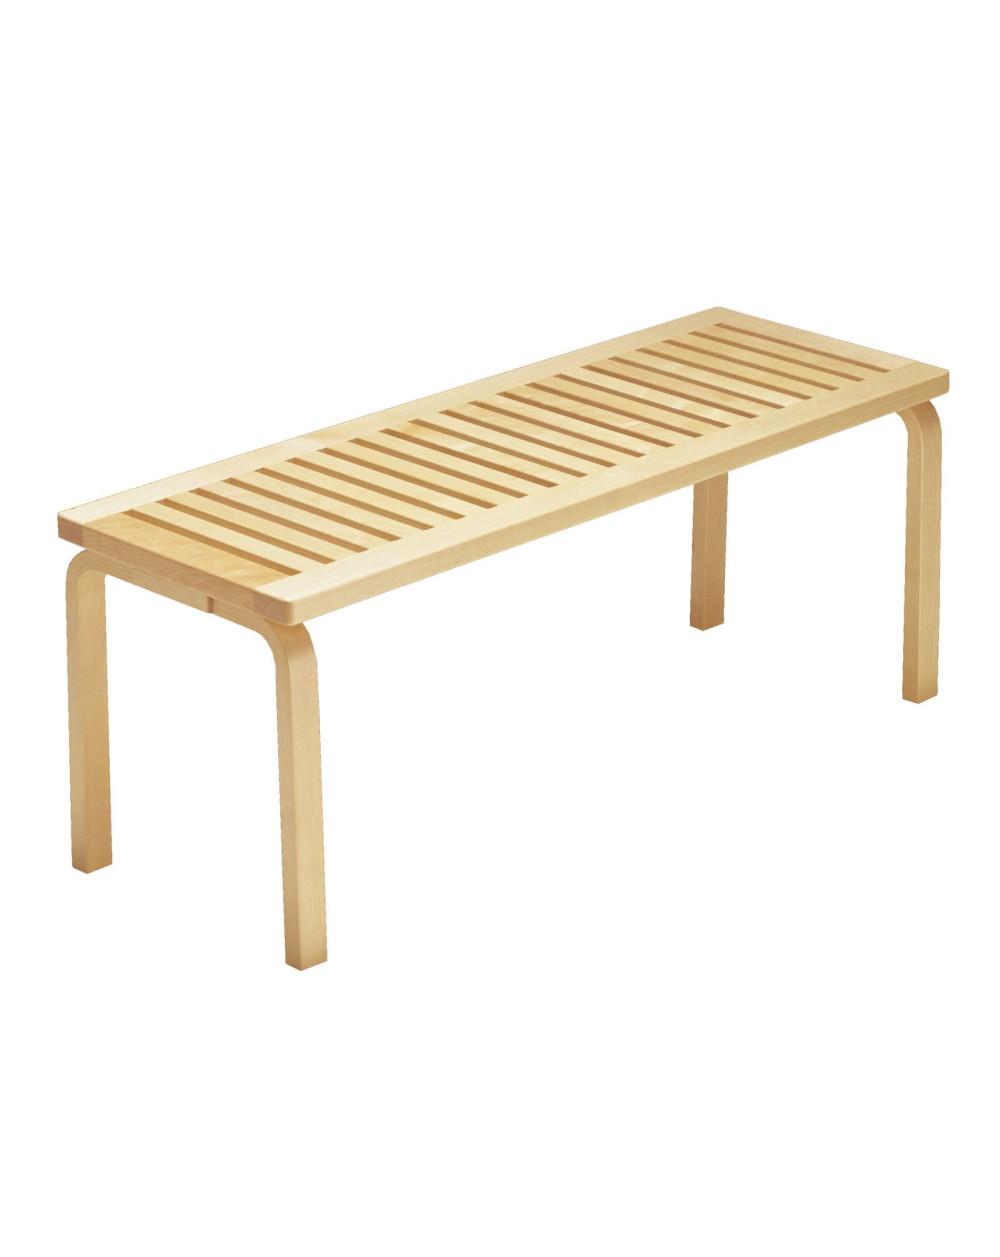 153 Bench, Alvar Aalto